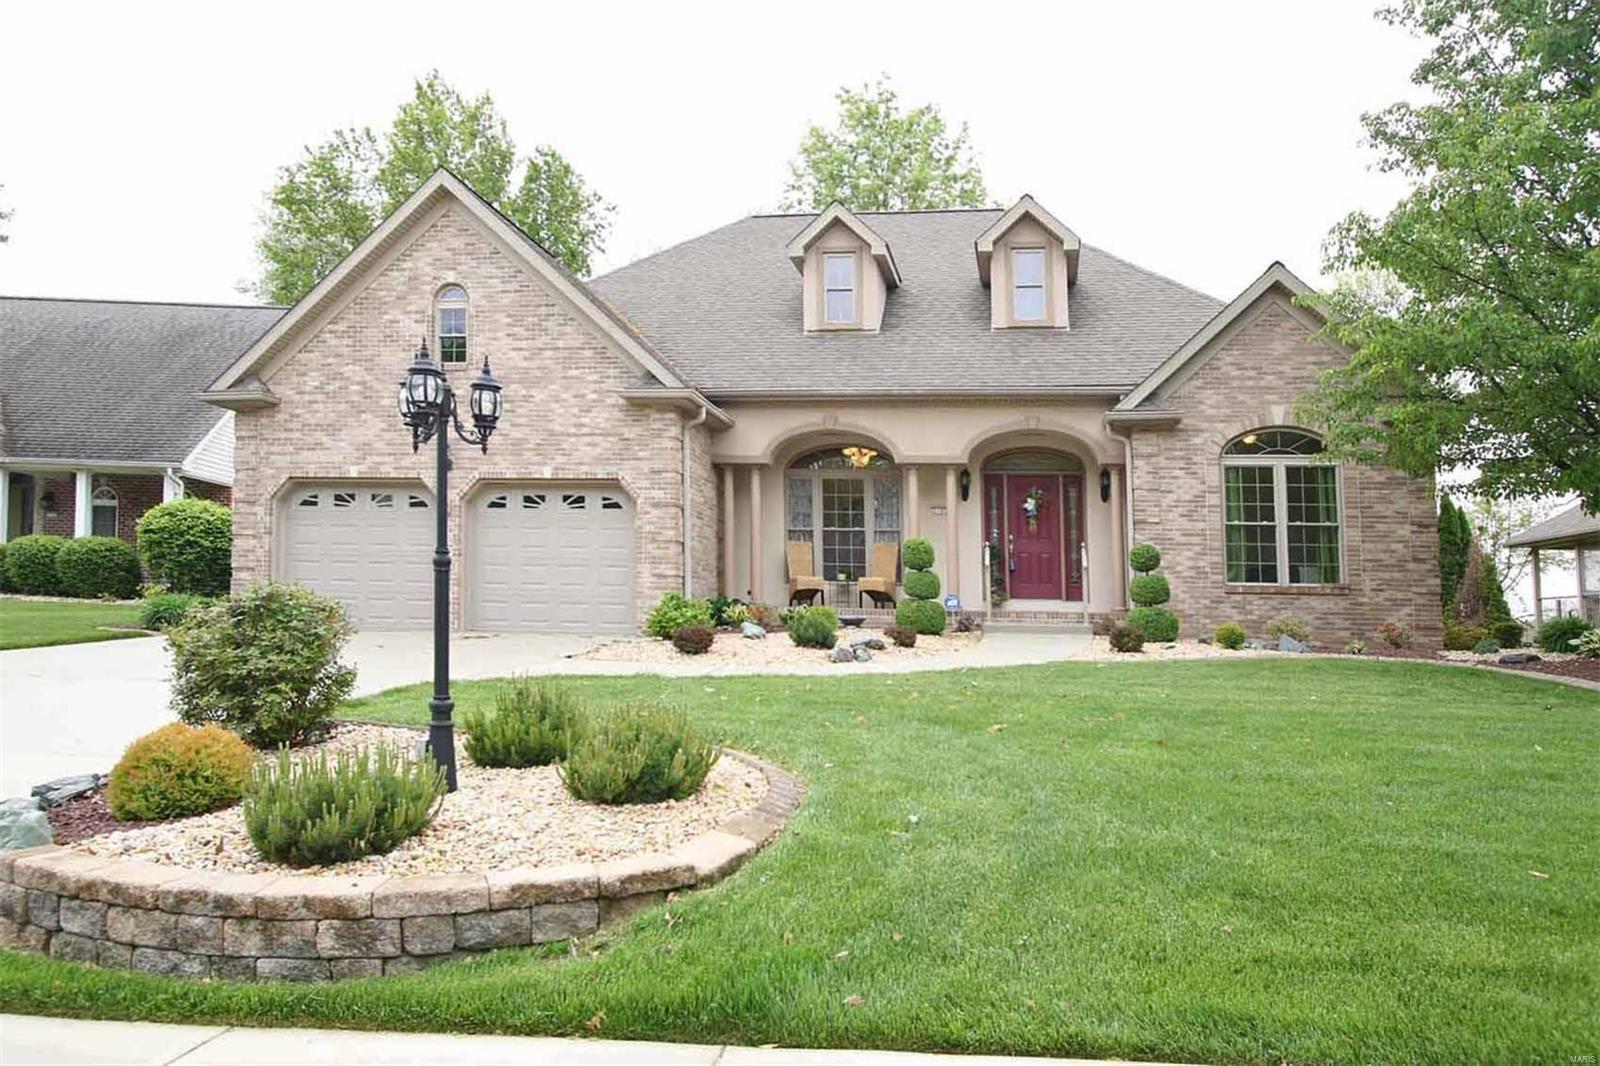 1105 White Oak Trail Property Photo - Godfrey, IL real estate listing